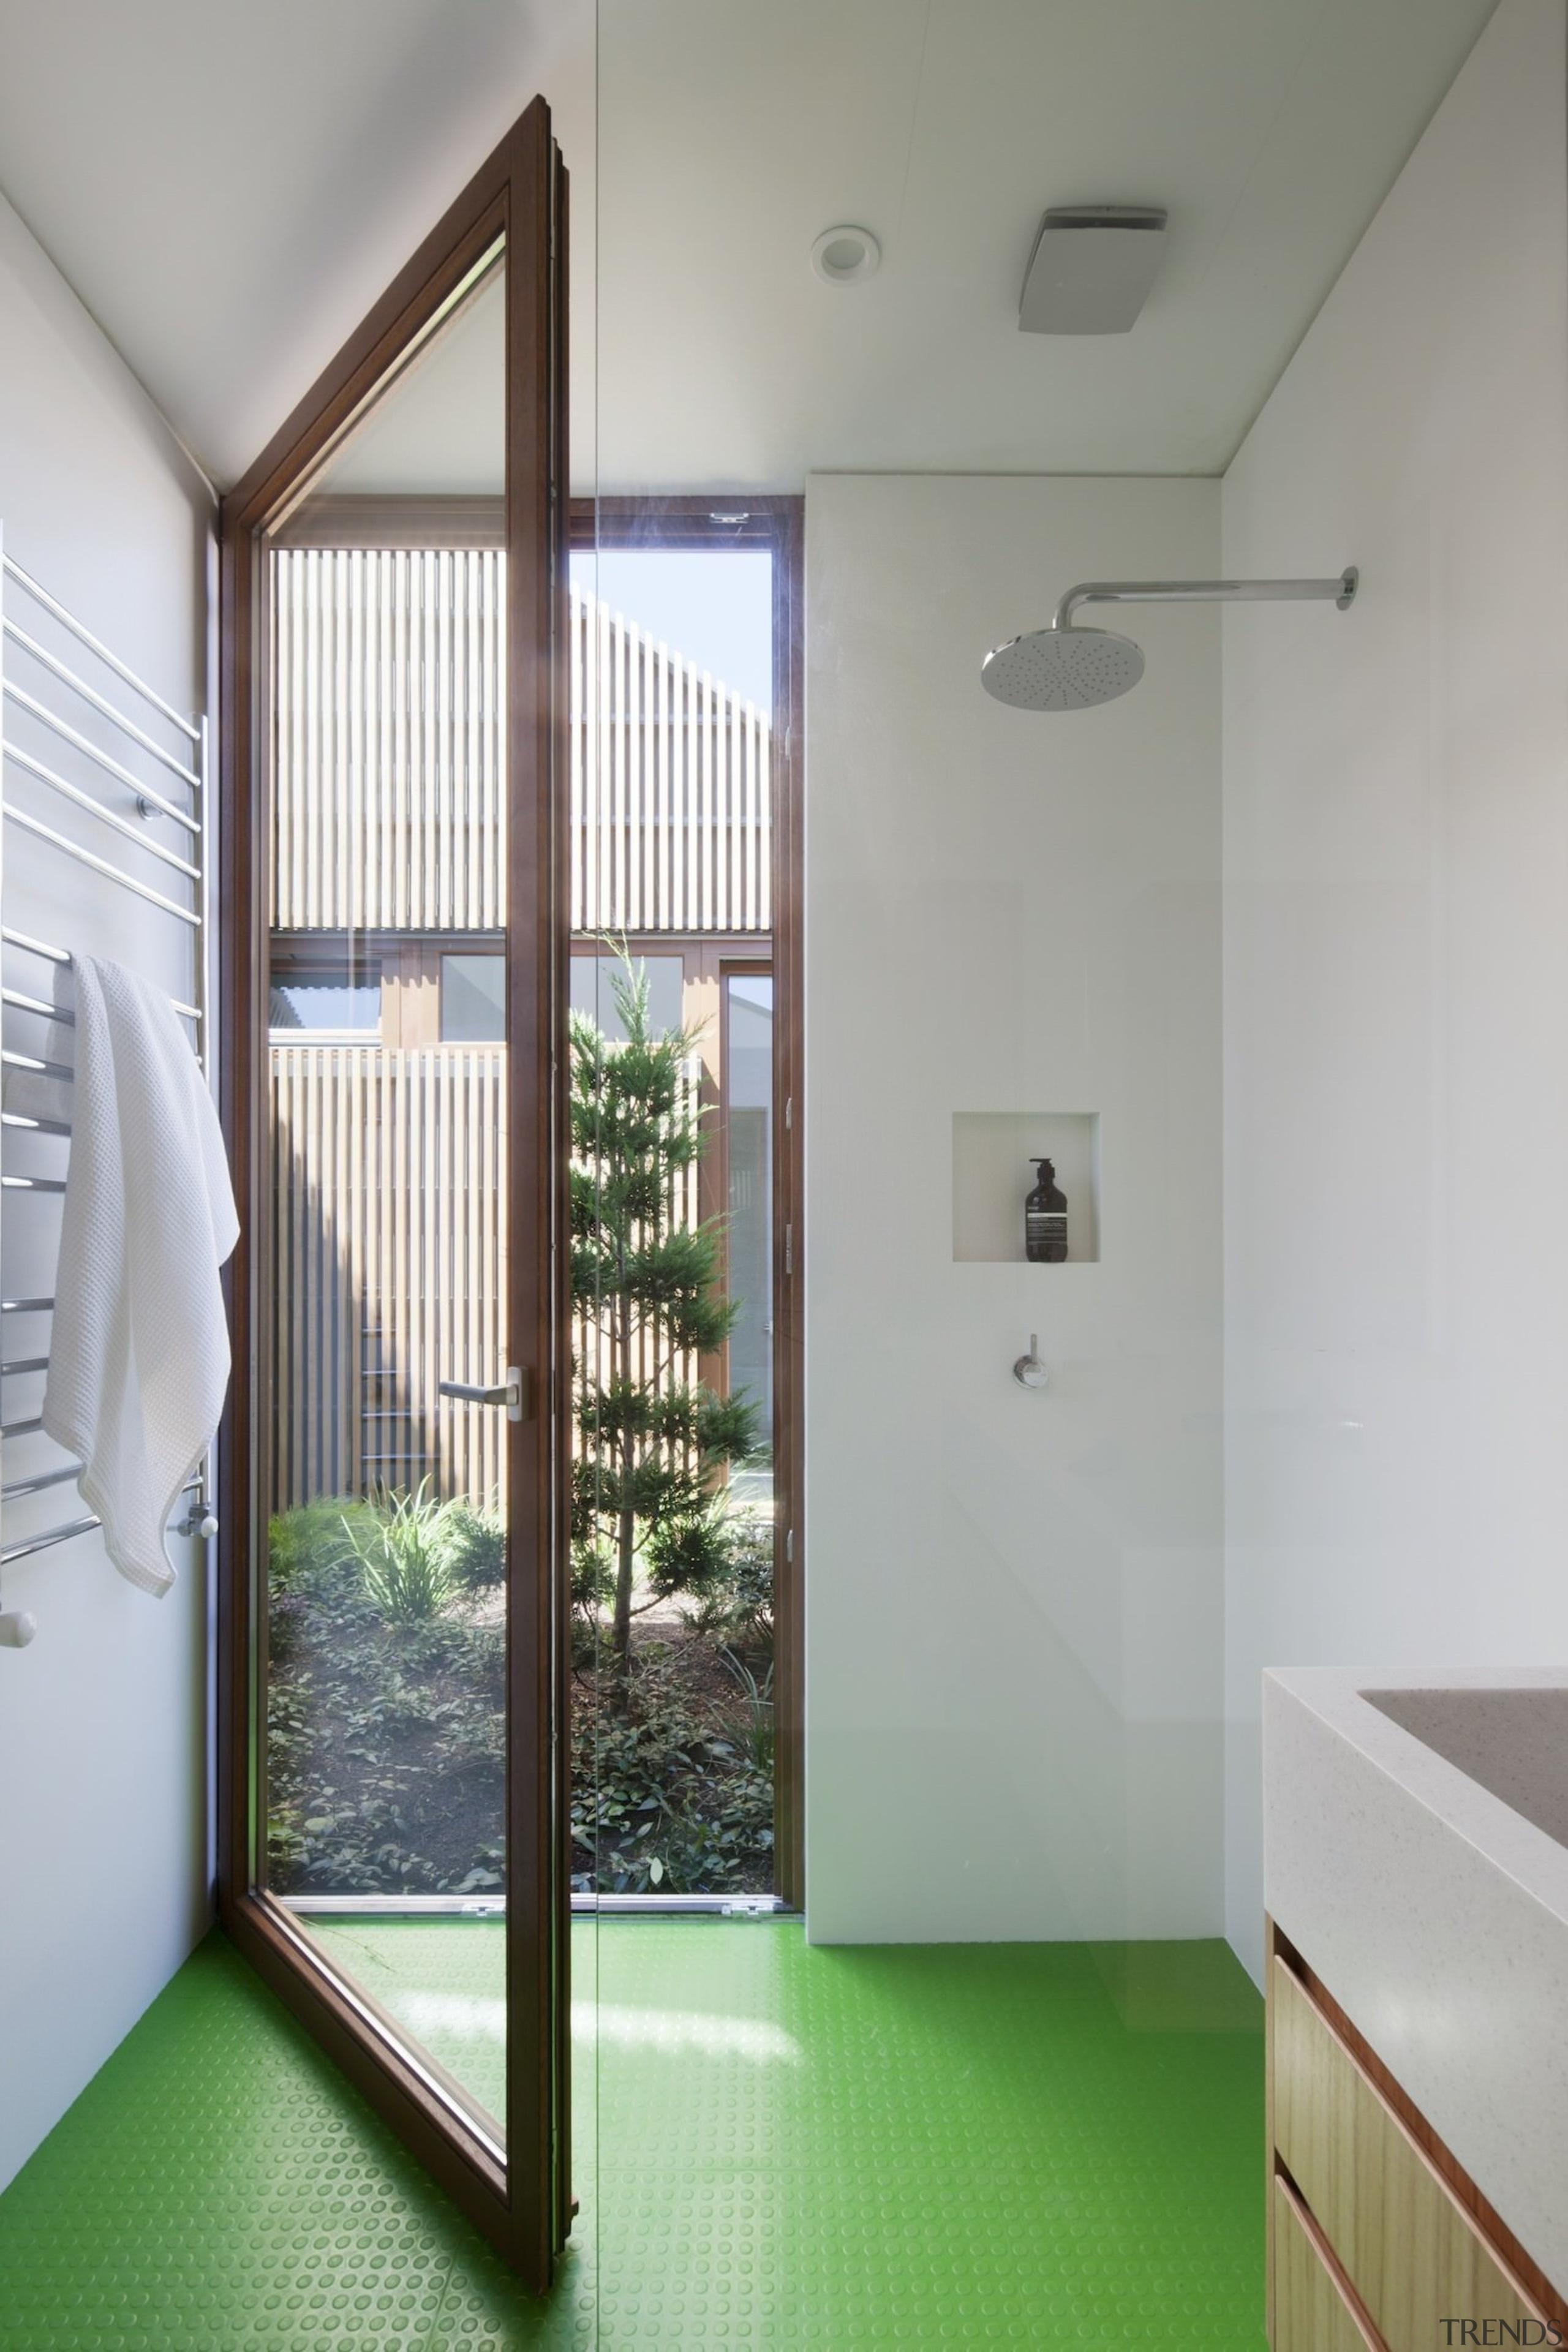 Architect: Steffen Welsch ArchitectsPhotography by Shannon McGrath architecture, ceiling, daylighting, door, floor, home, house, interior design, real estate, room, window, gray